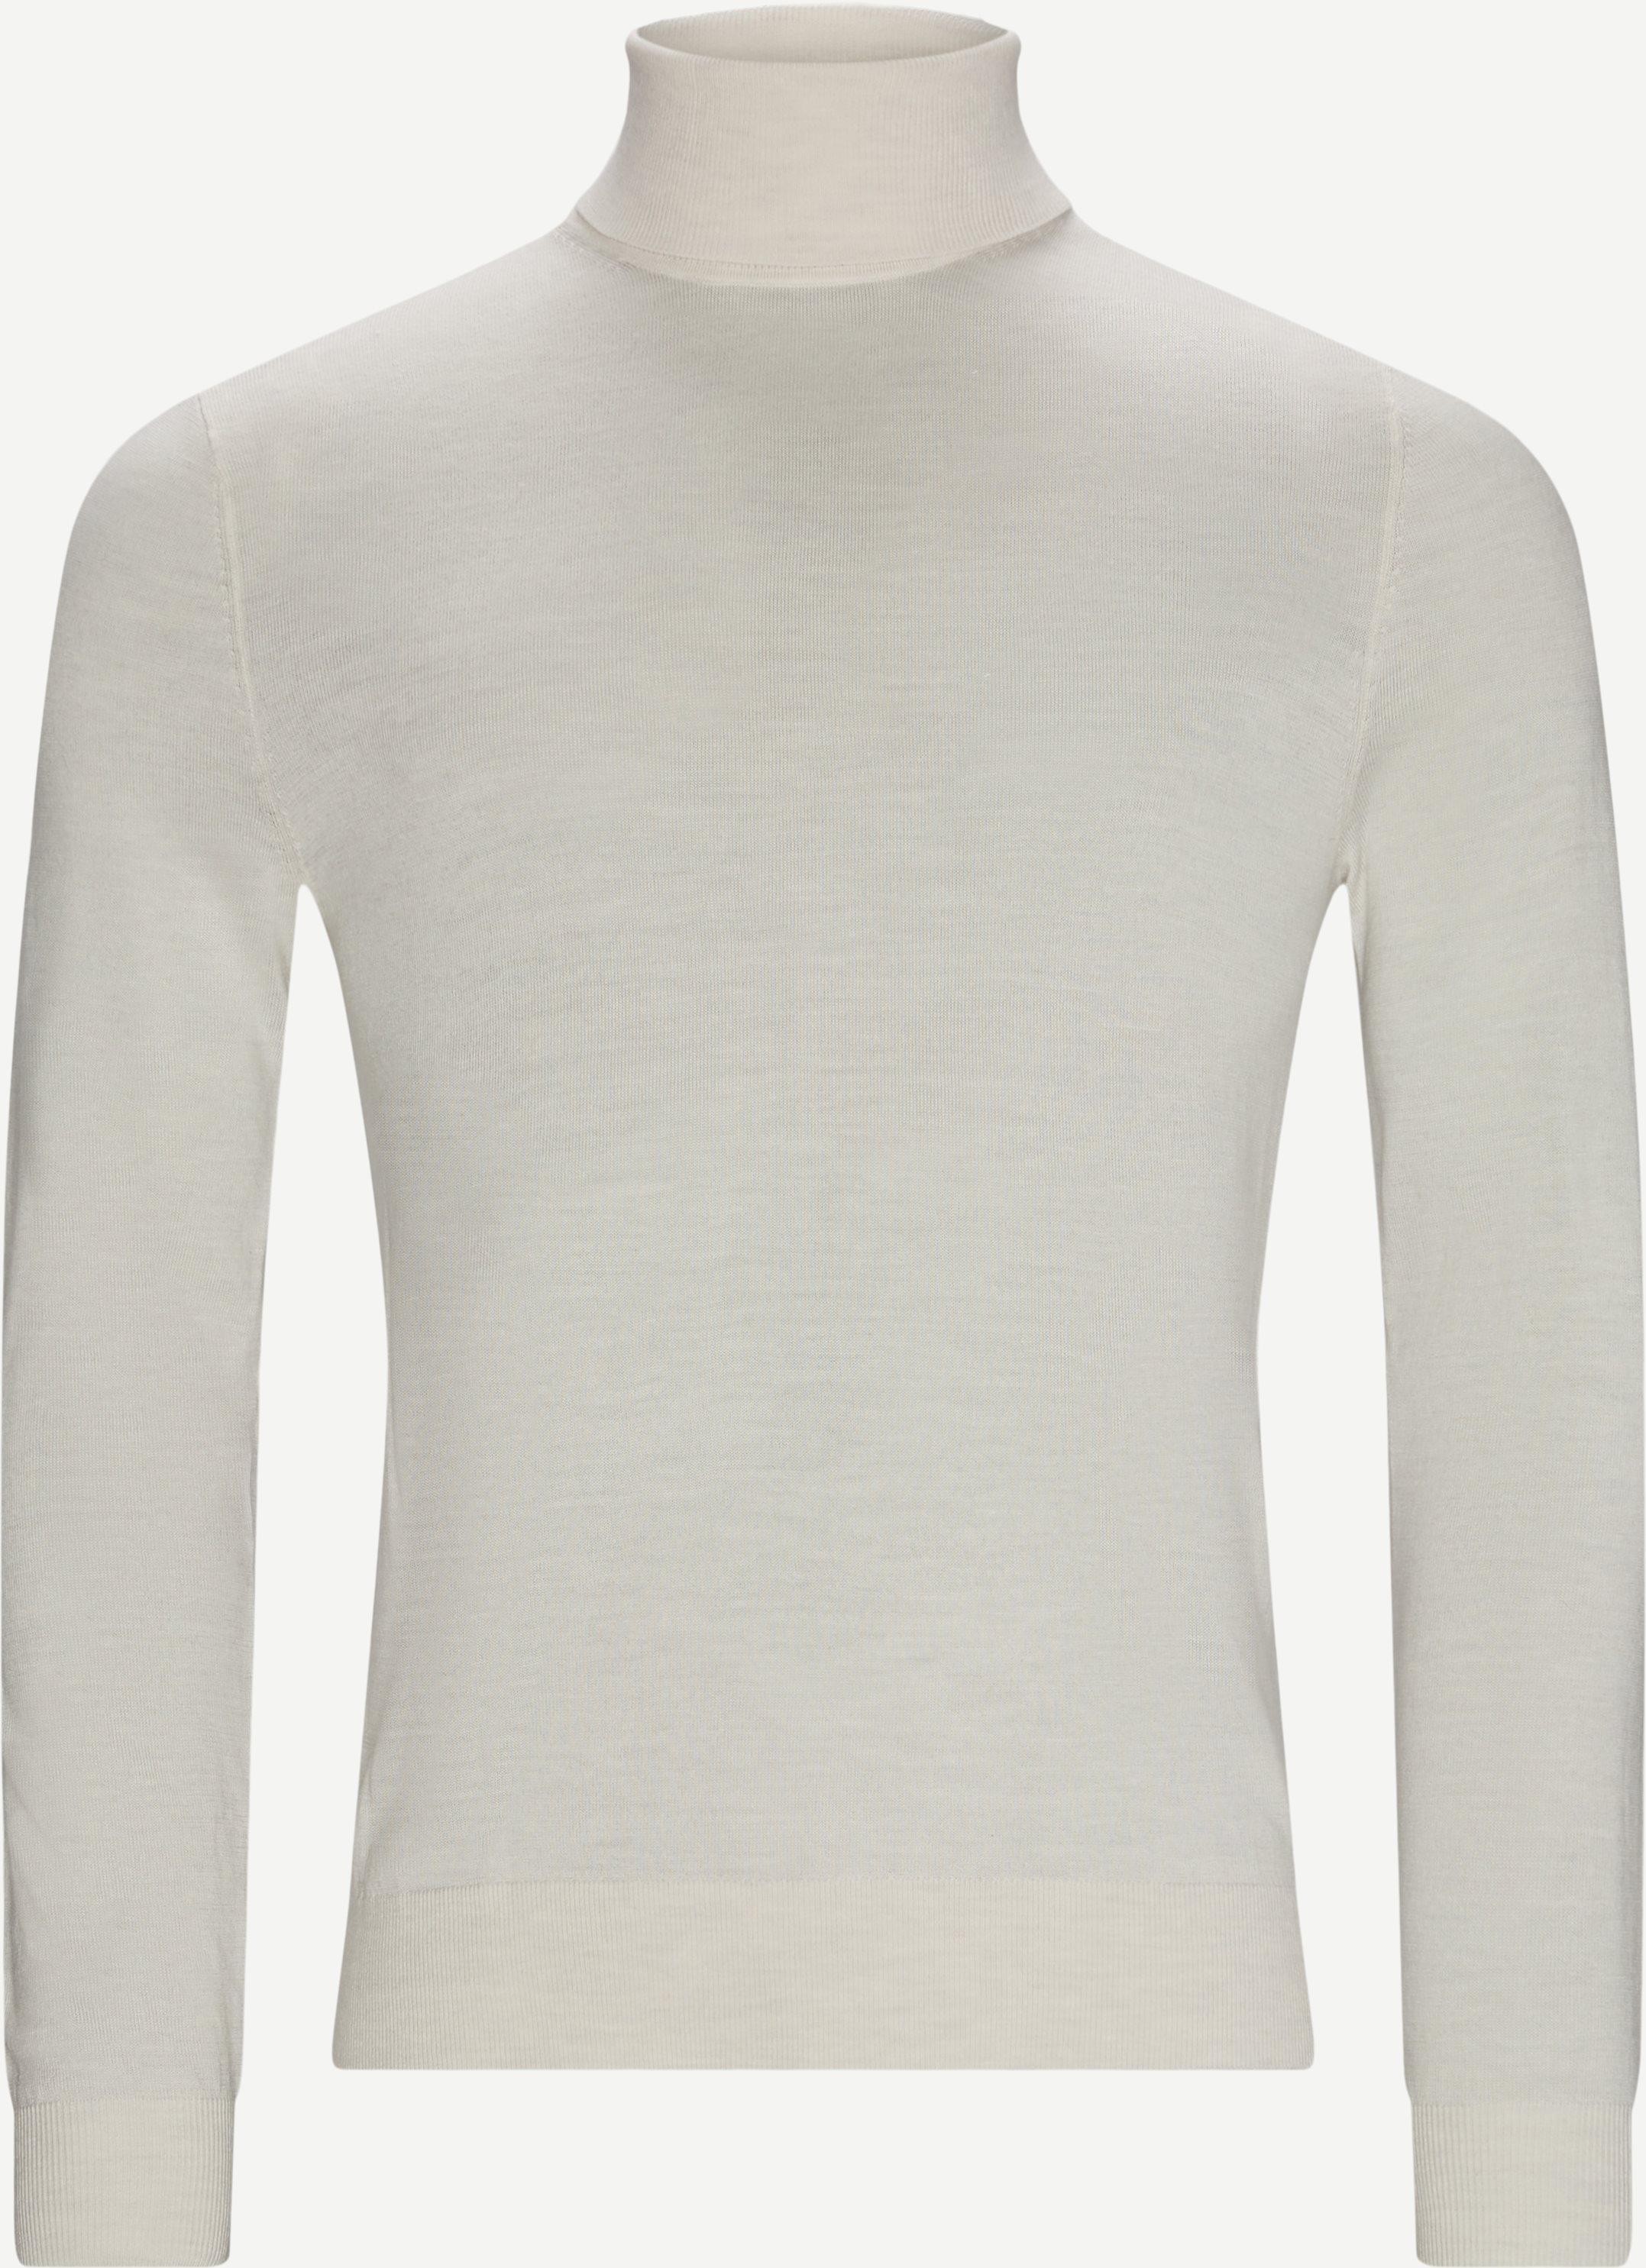 Knitwear - Slim fit - Sand